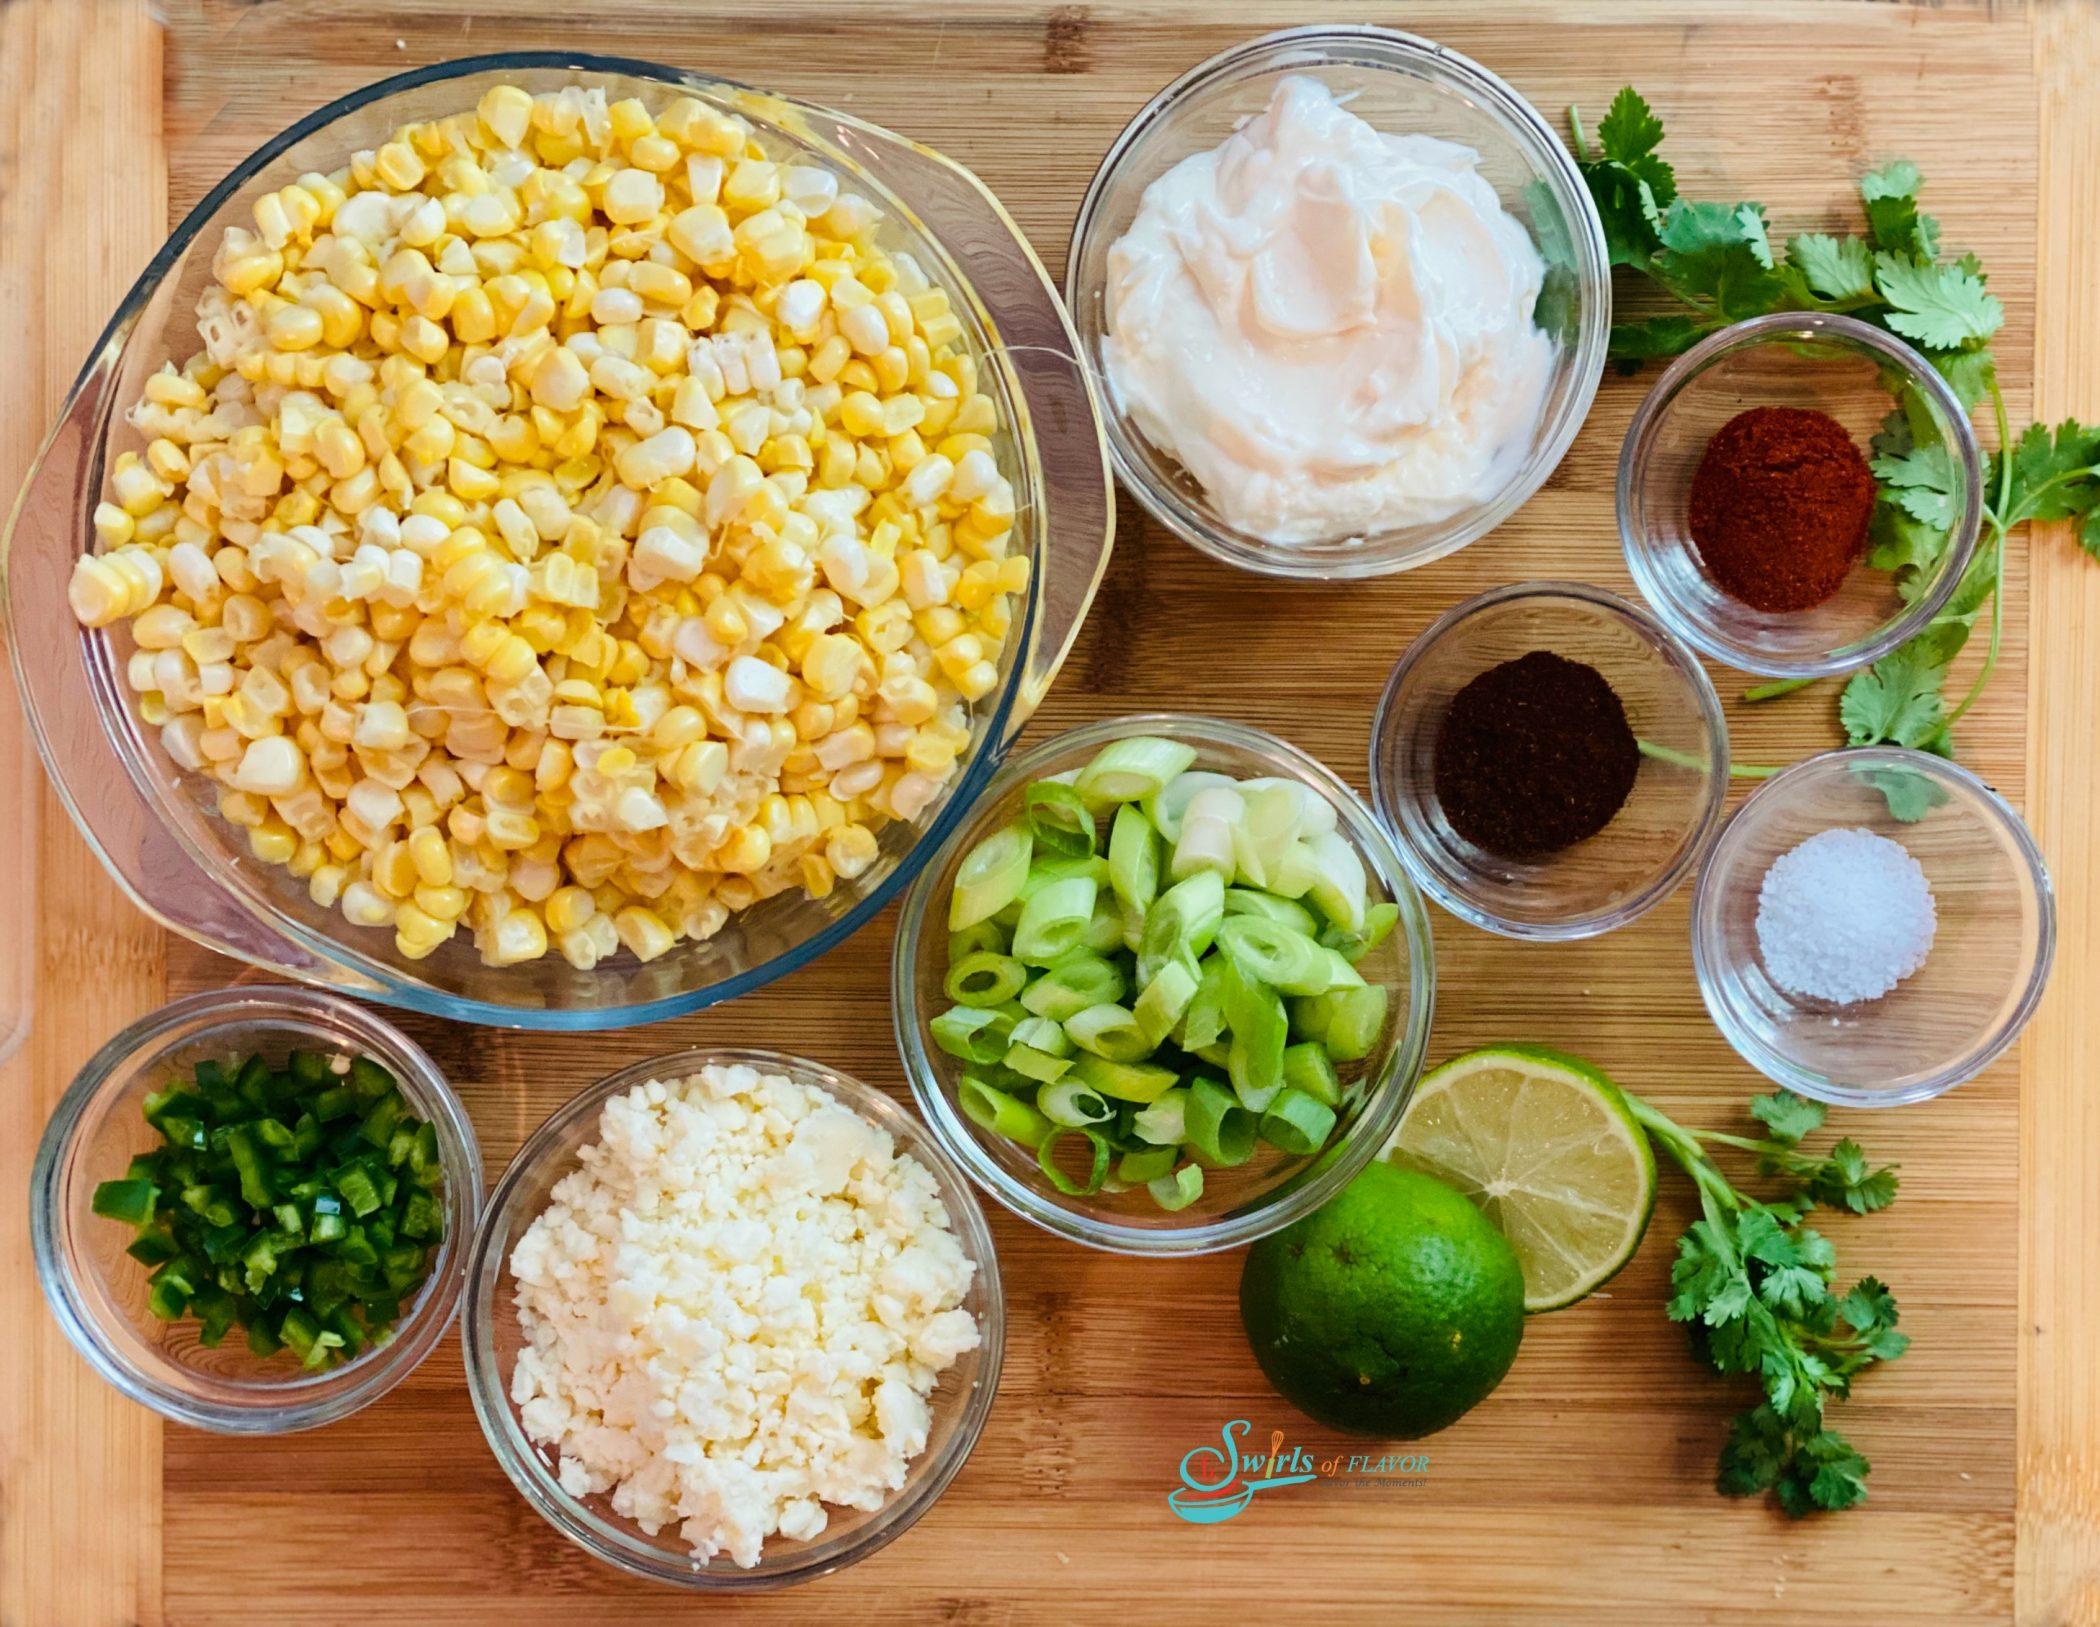 ingredients in corn salad recipe